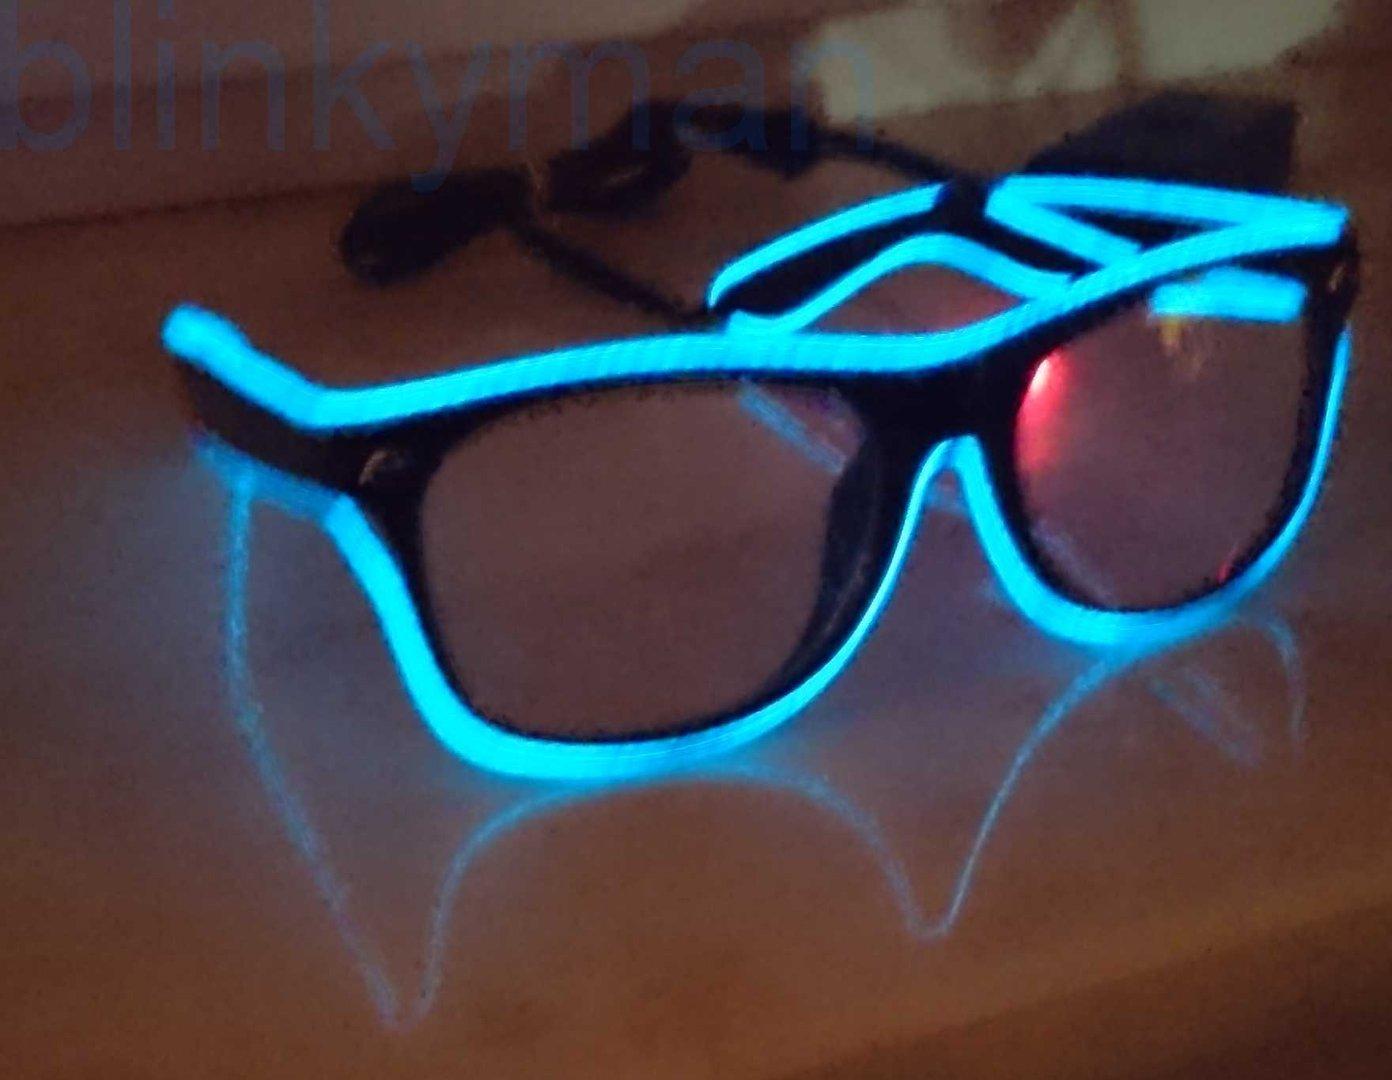 neu 2018 el wire sunglasses gruen sonnenbrille wave effekt ray. Black Bedroom Furniture Sets. Home Design Ideas